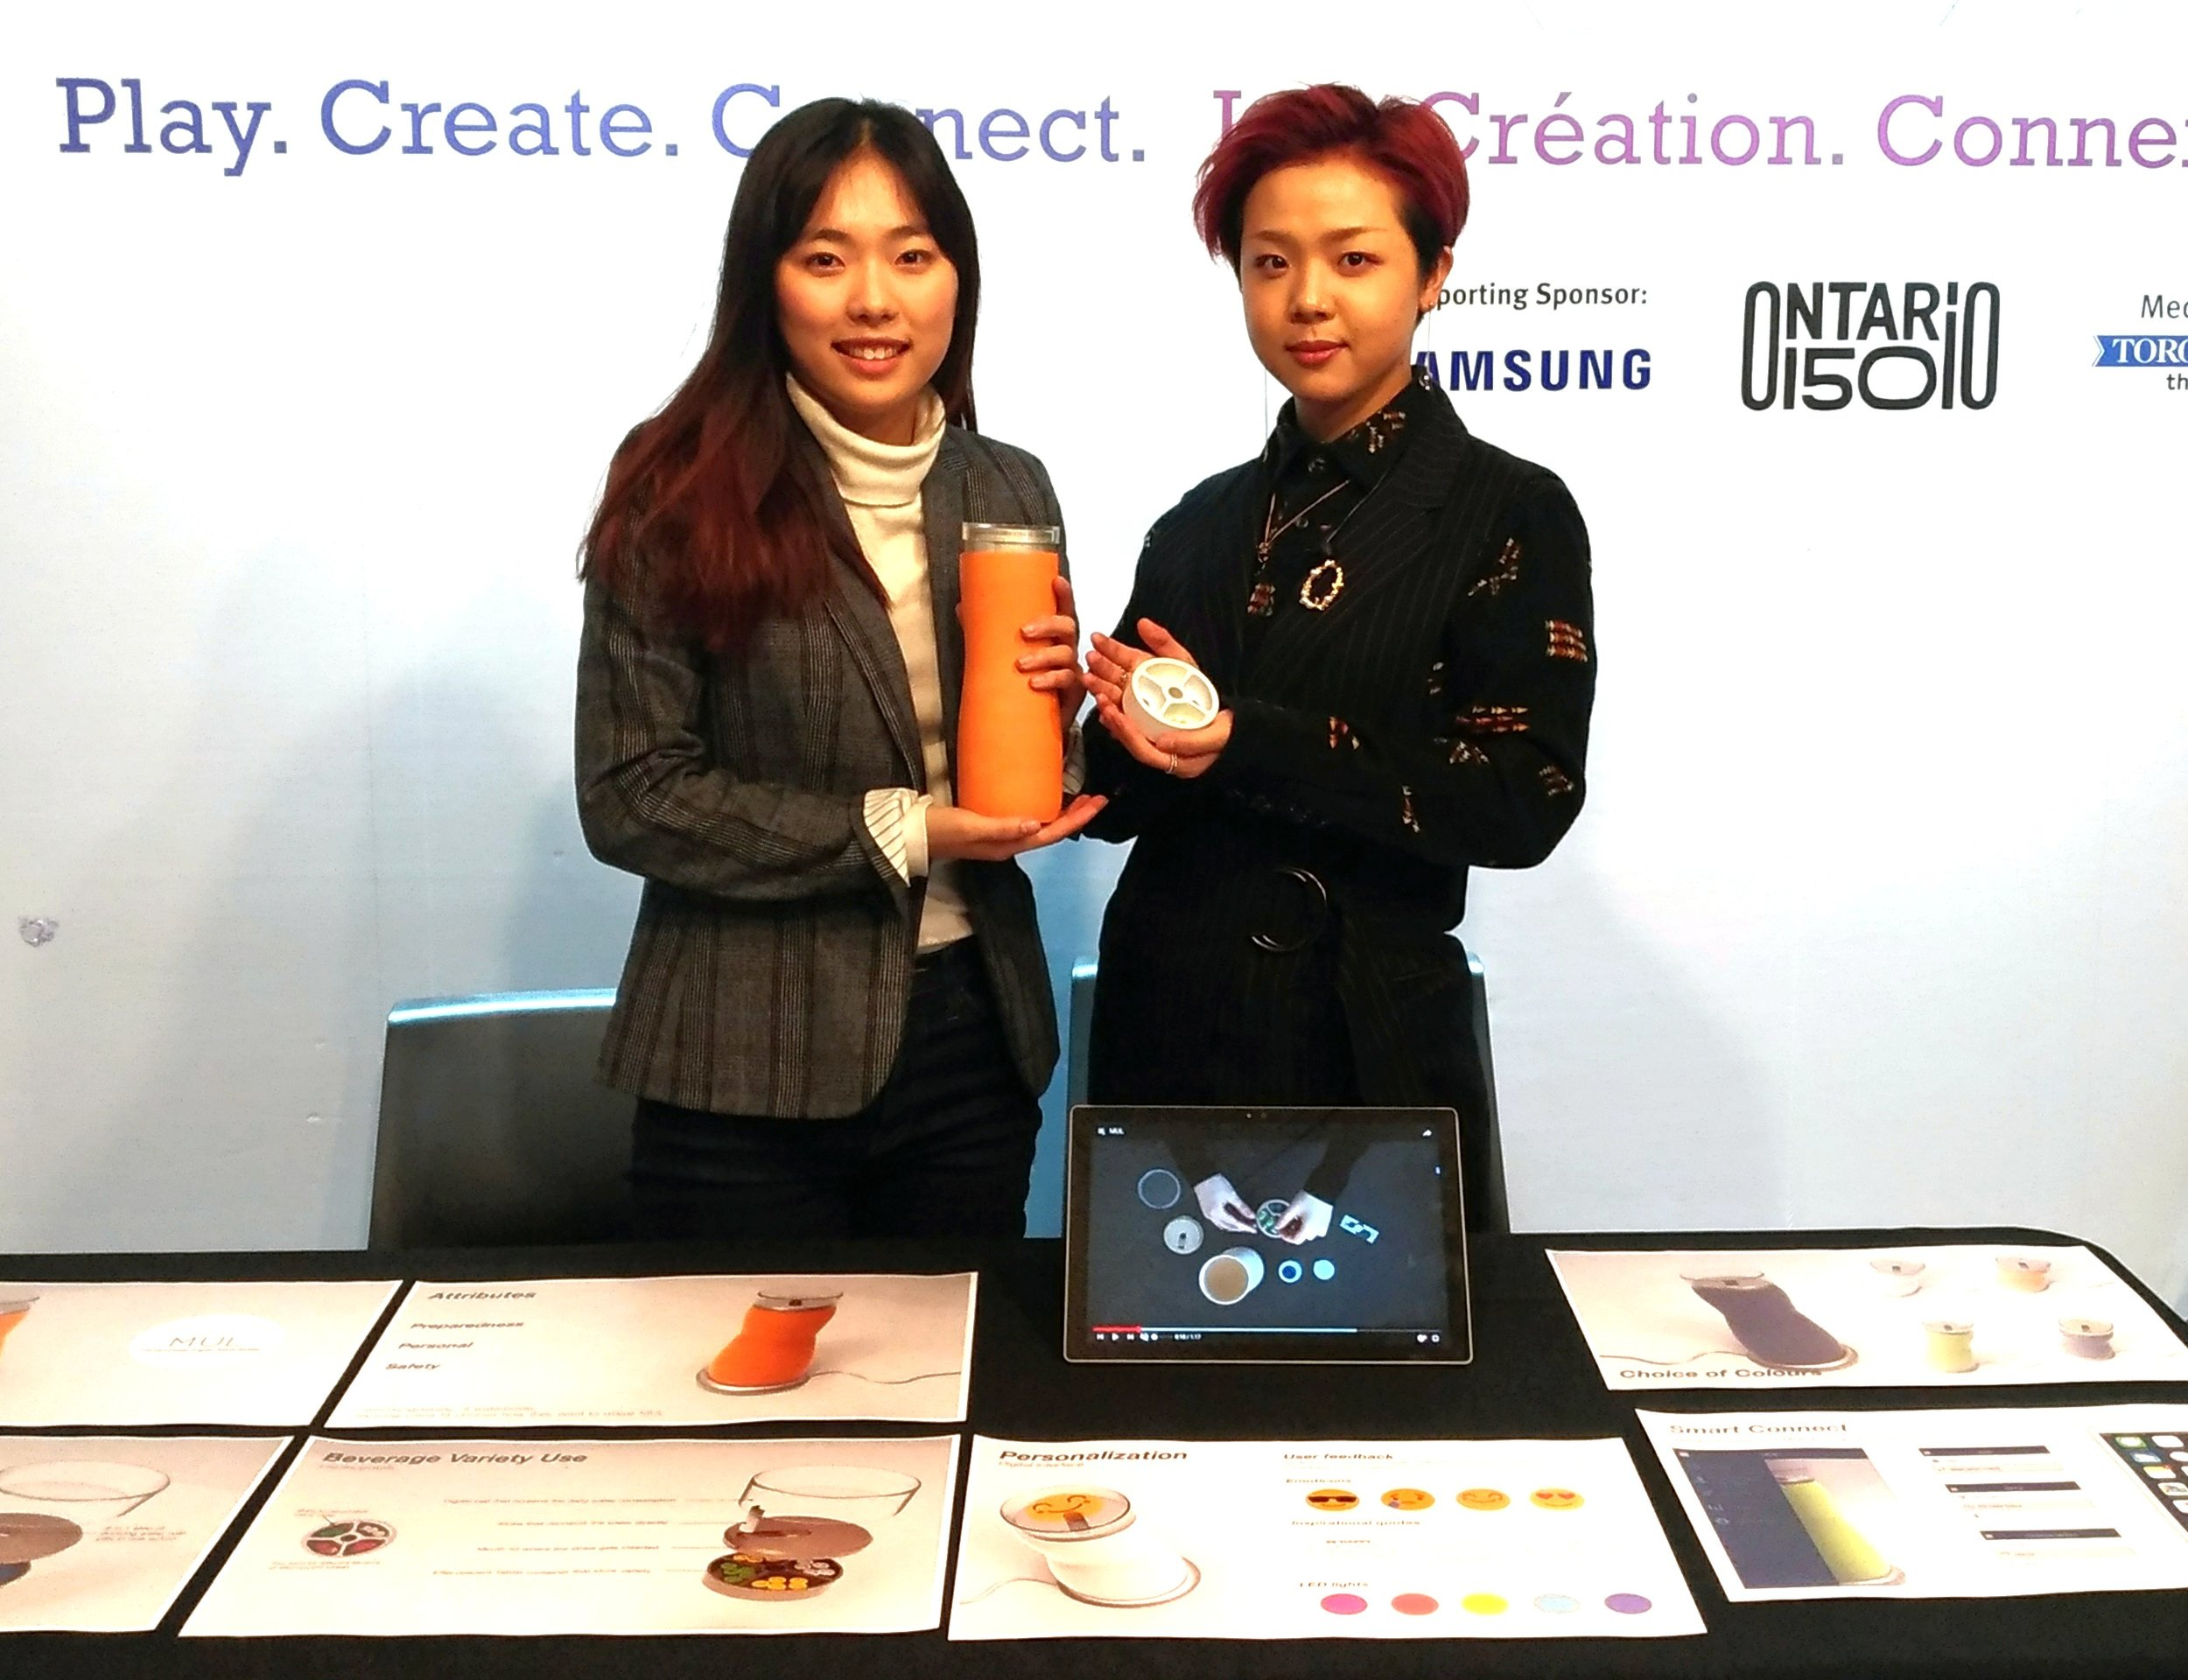 3_Industrial Designers Mikayla - Seung Hwa Koo and Winnie Chen.jpg